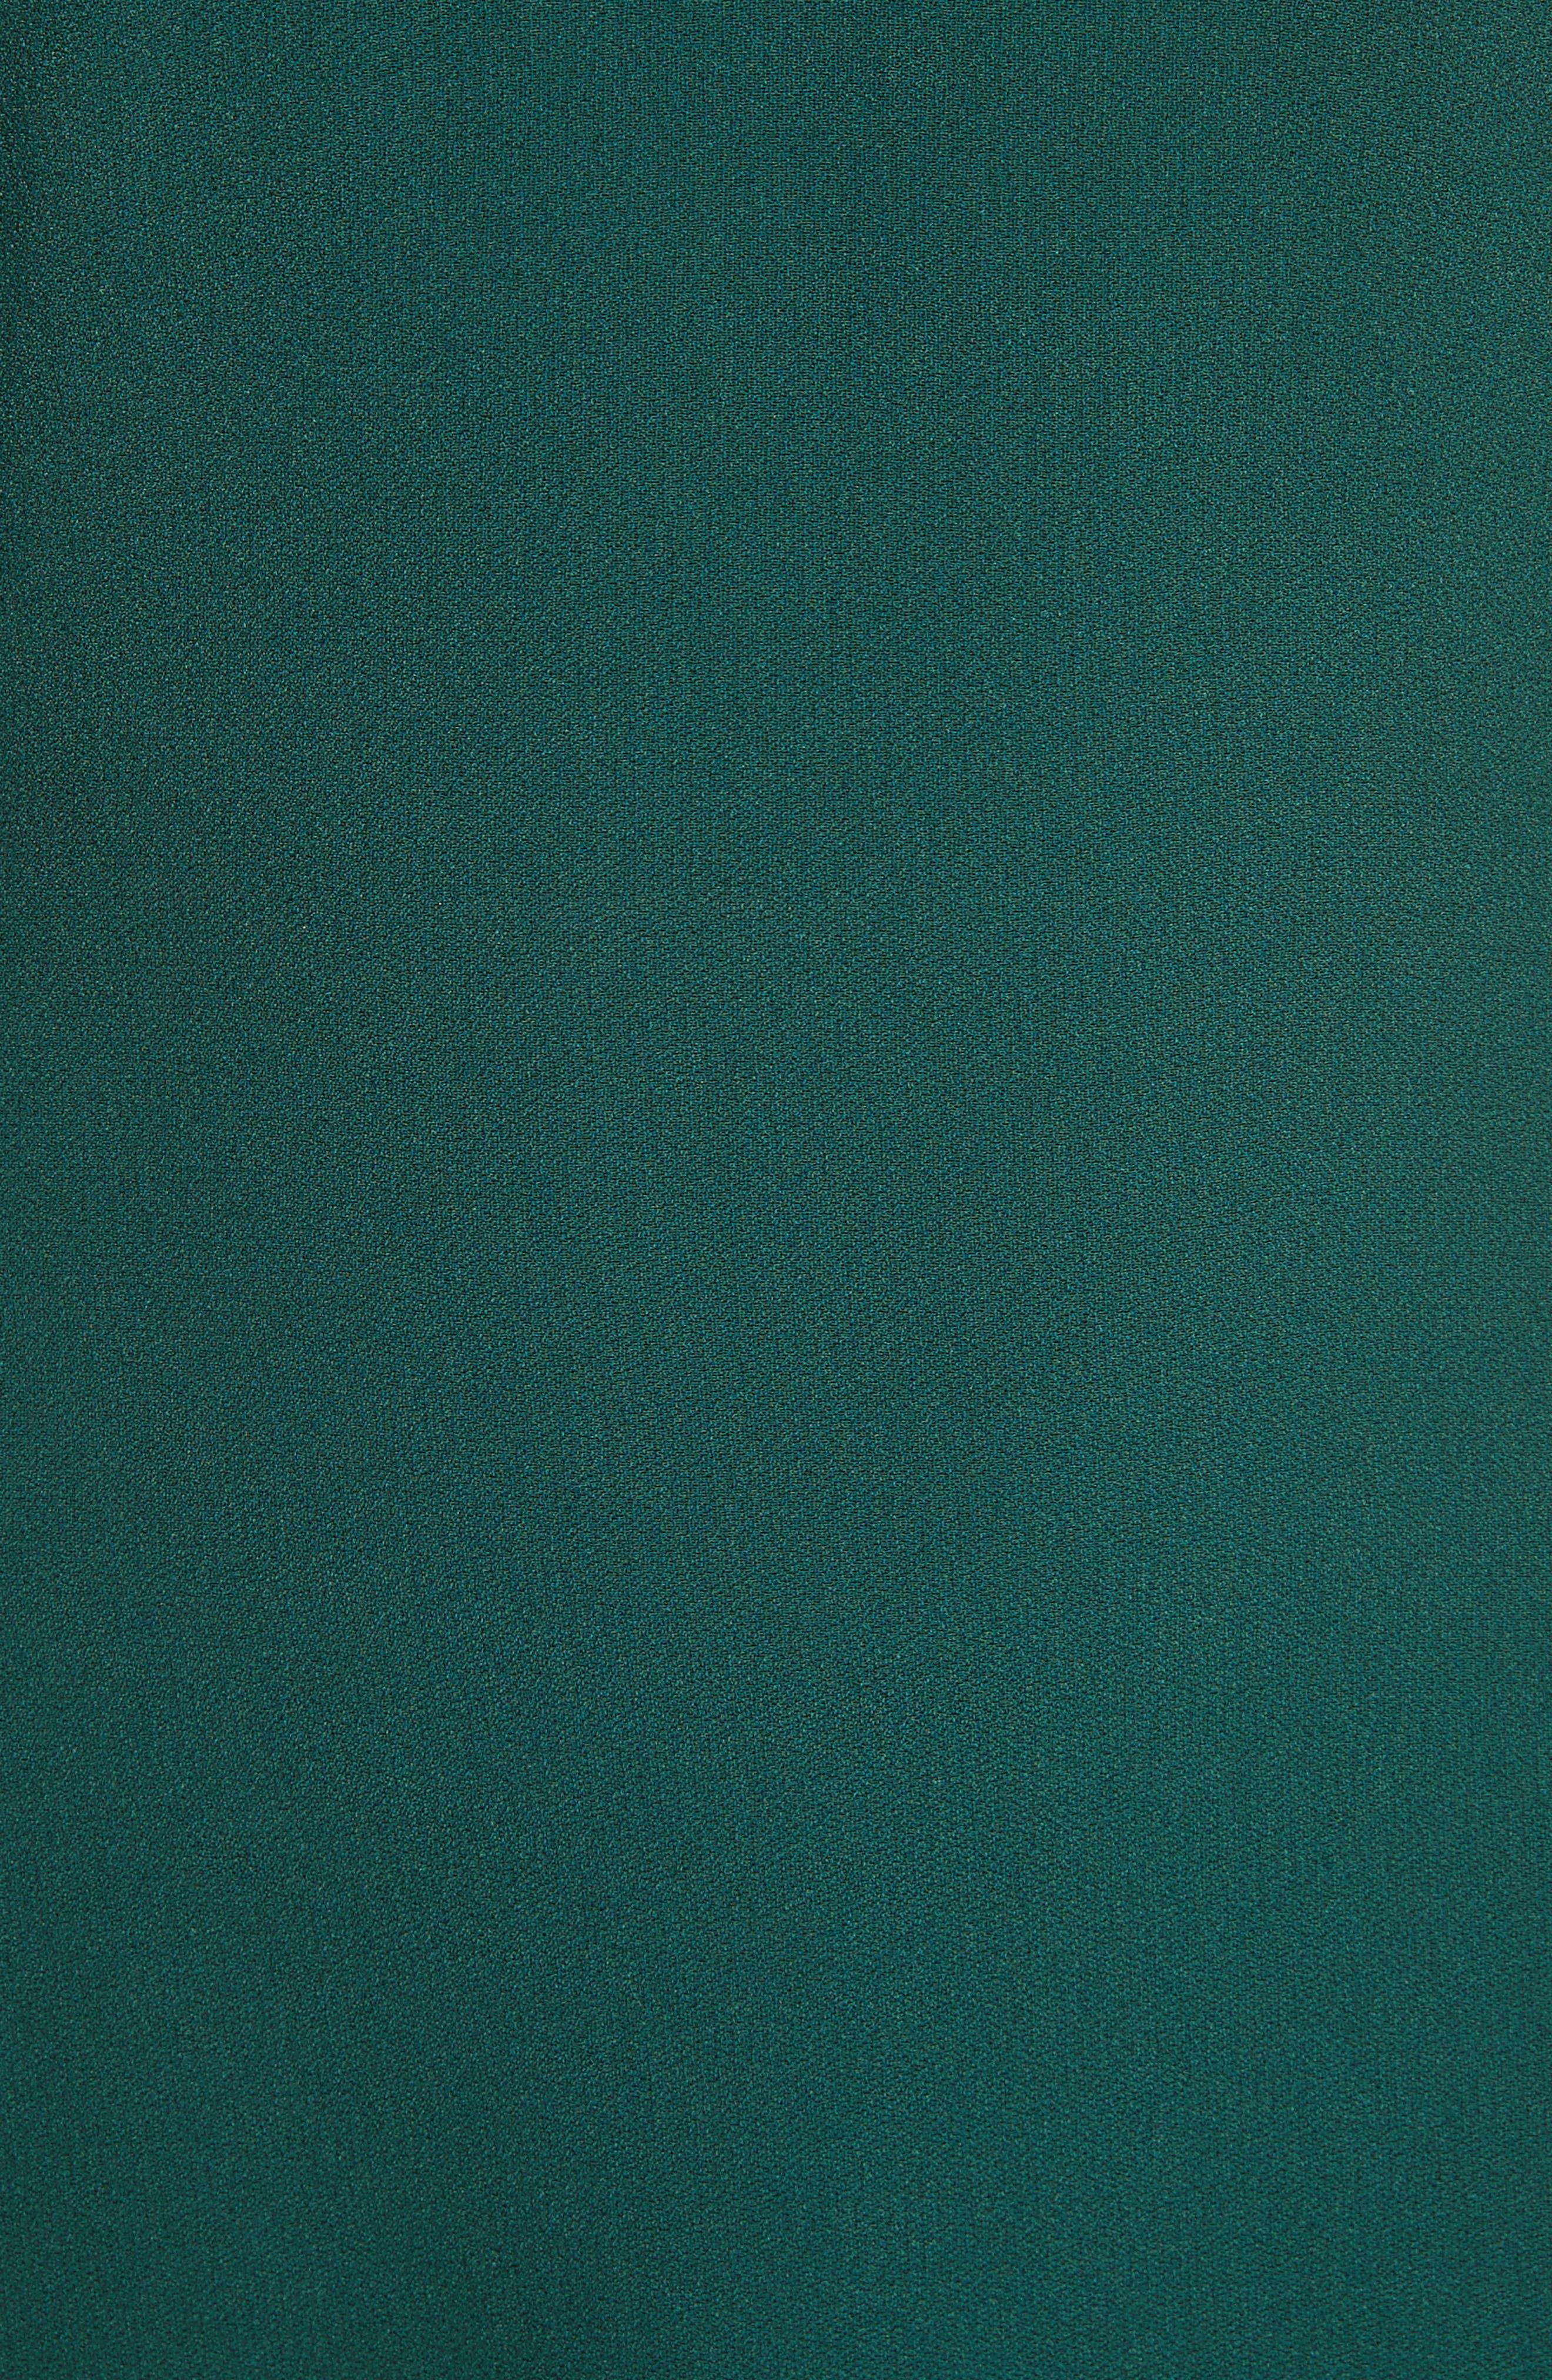 Kensington Lace-Up A-Line Dress,                             Alternate thumbnail 5, color,                             Bright Hunter